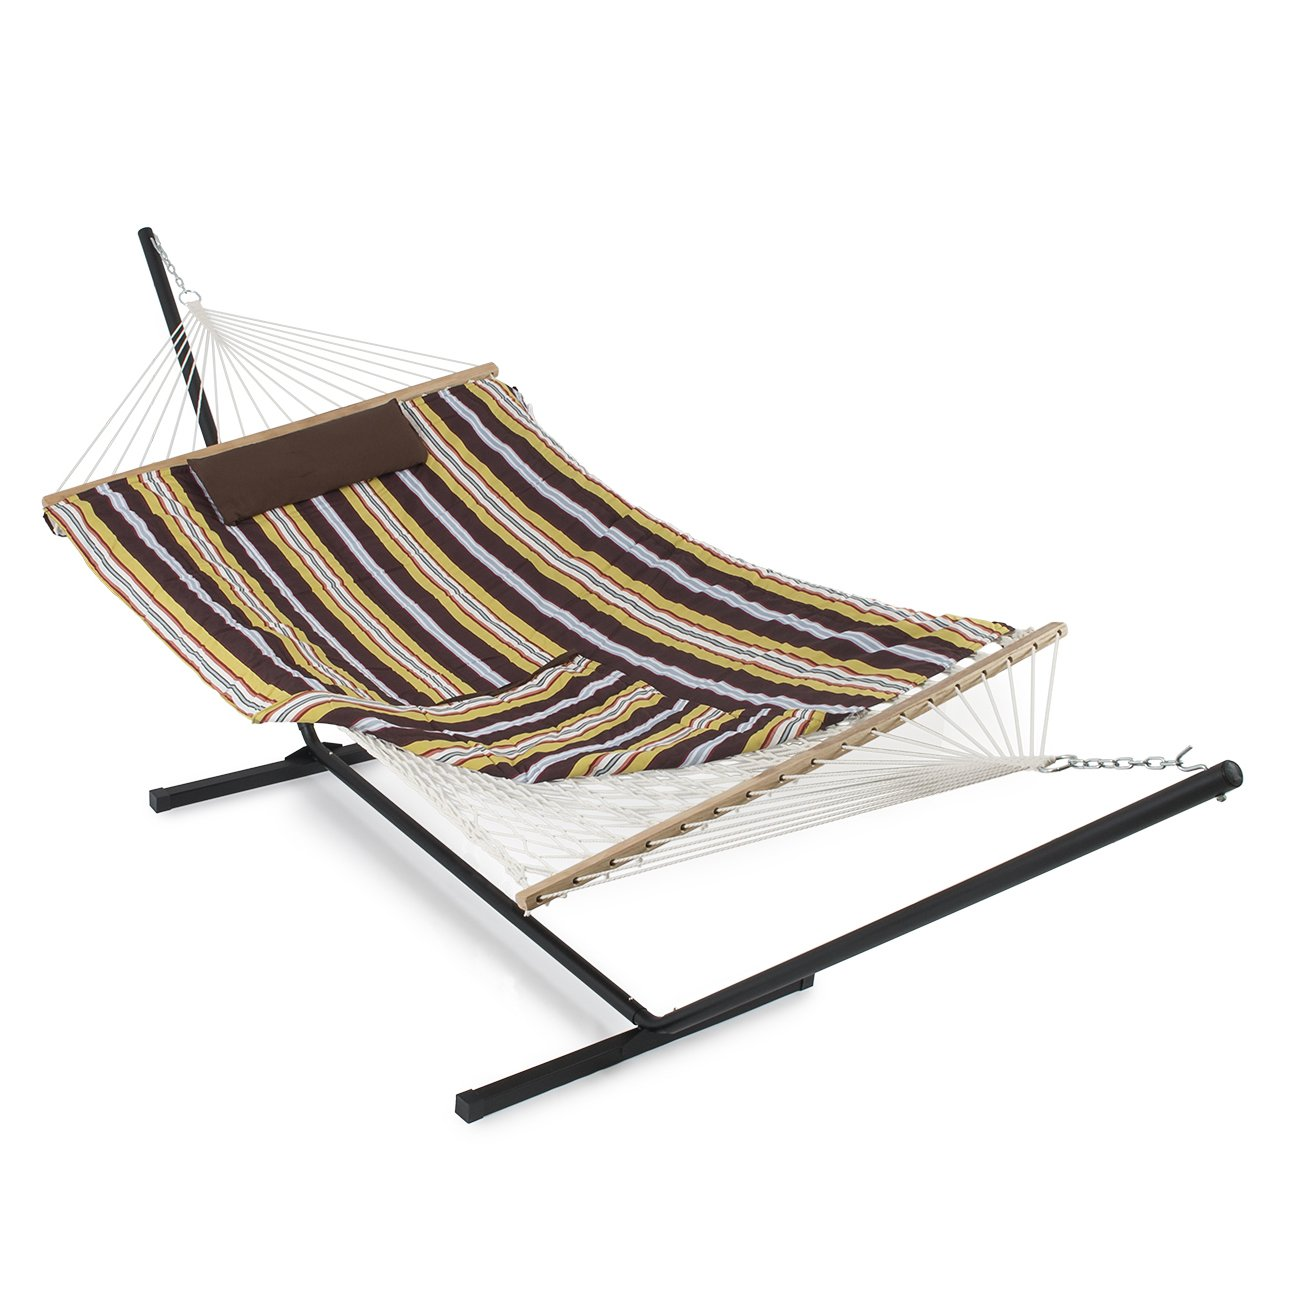 empirepatio hammock rope cottonrope itemdetail cotton